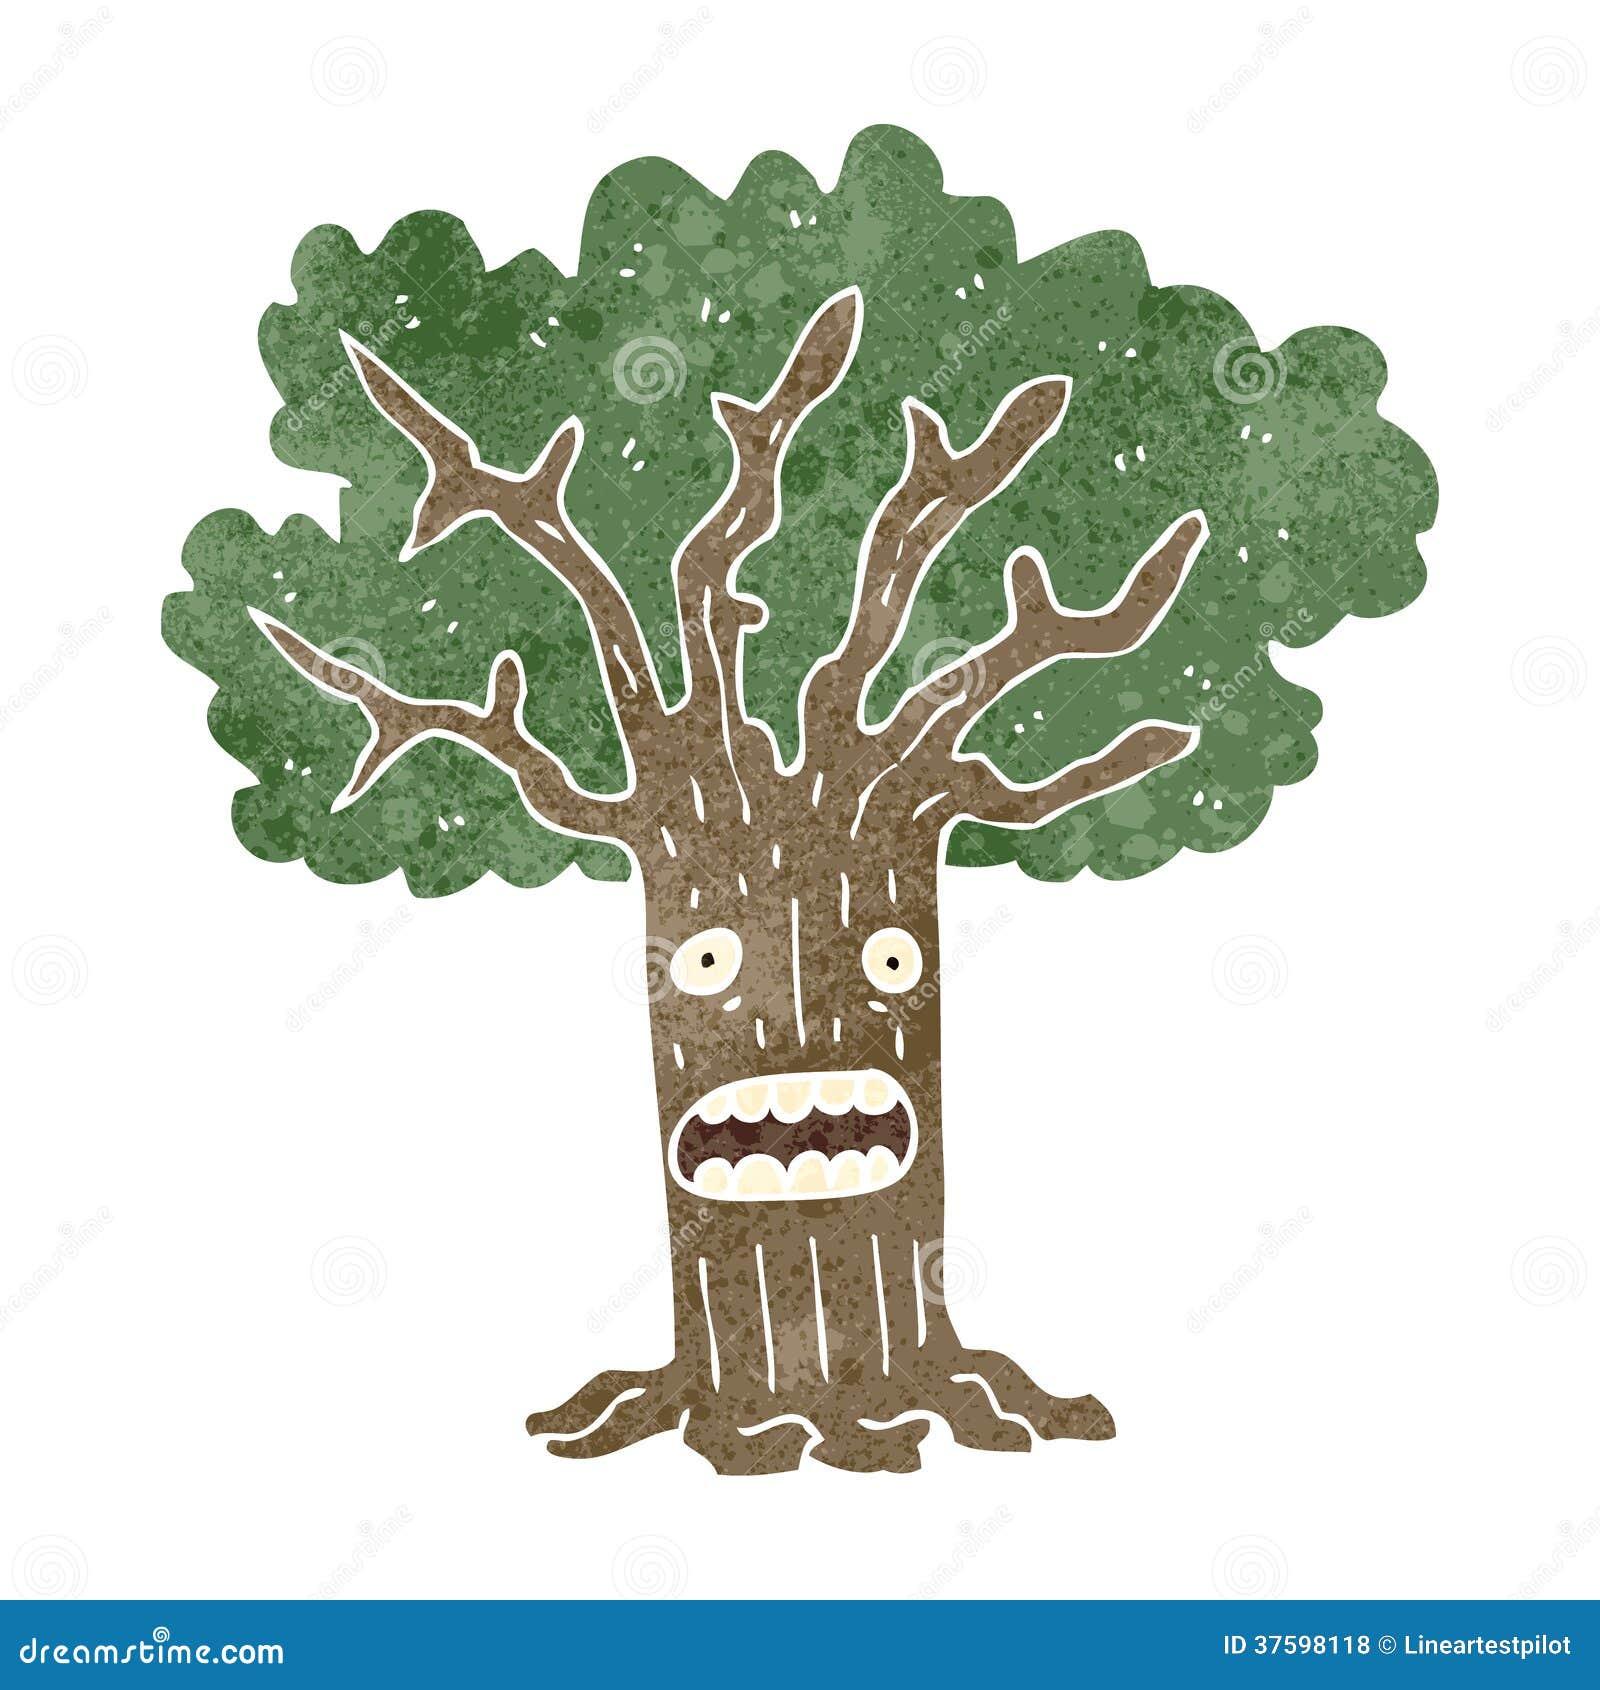 retro cartoon tree with worried face royalty free stock photos